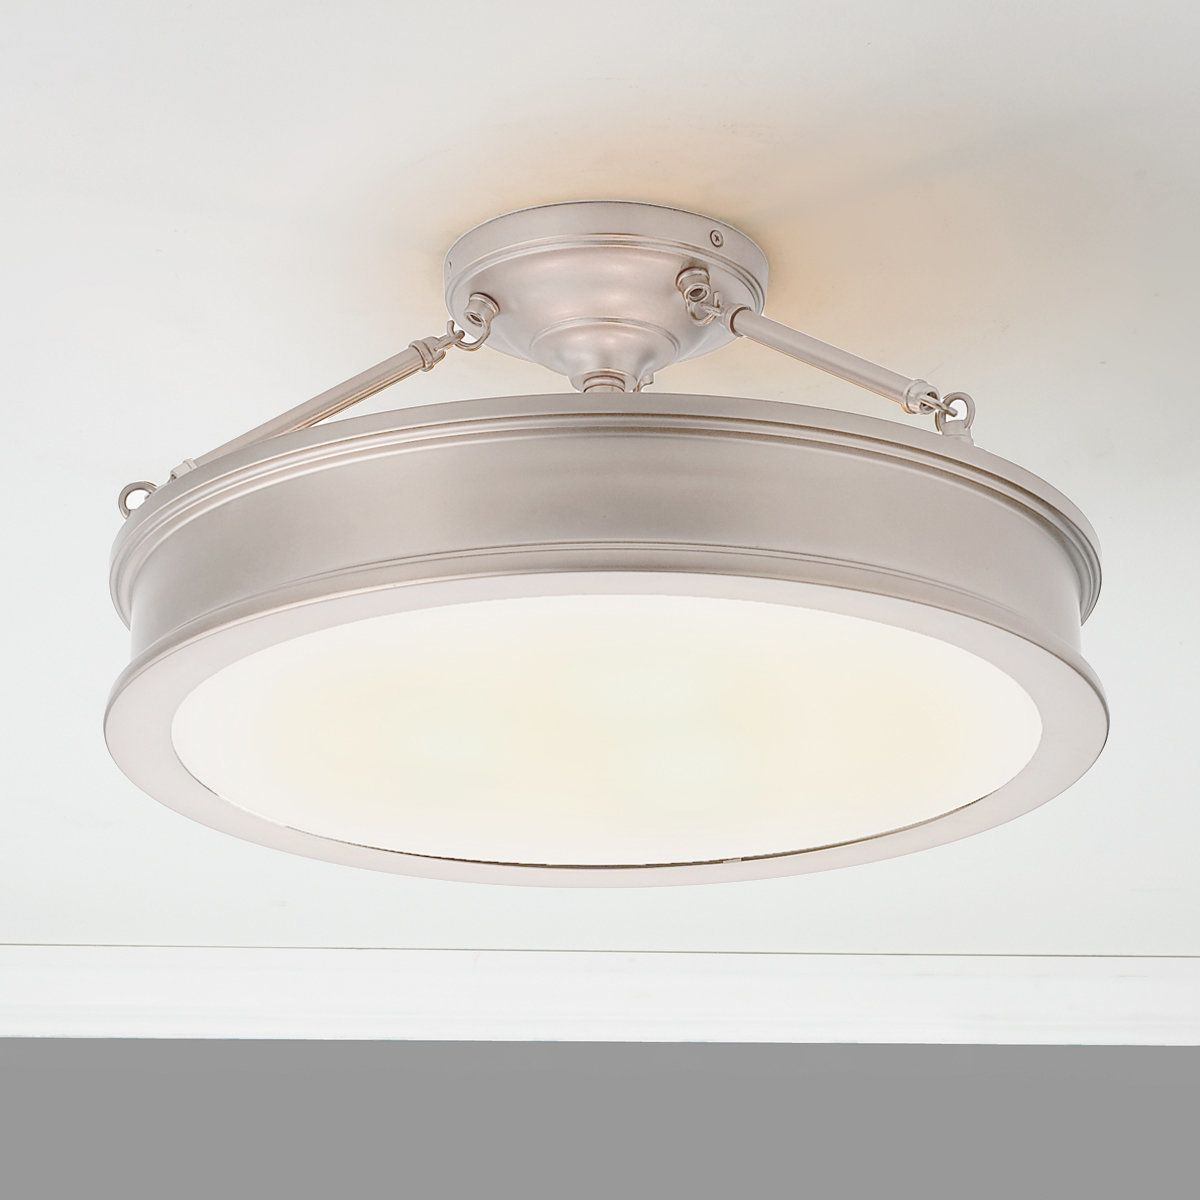 Traditional Urban Semi Flush Ceiling Light Semi Flush Ceiling Lights Bedroom Ceiling Light Ceiling Lights